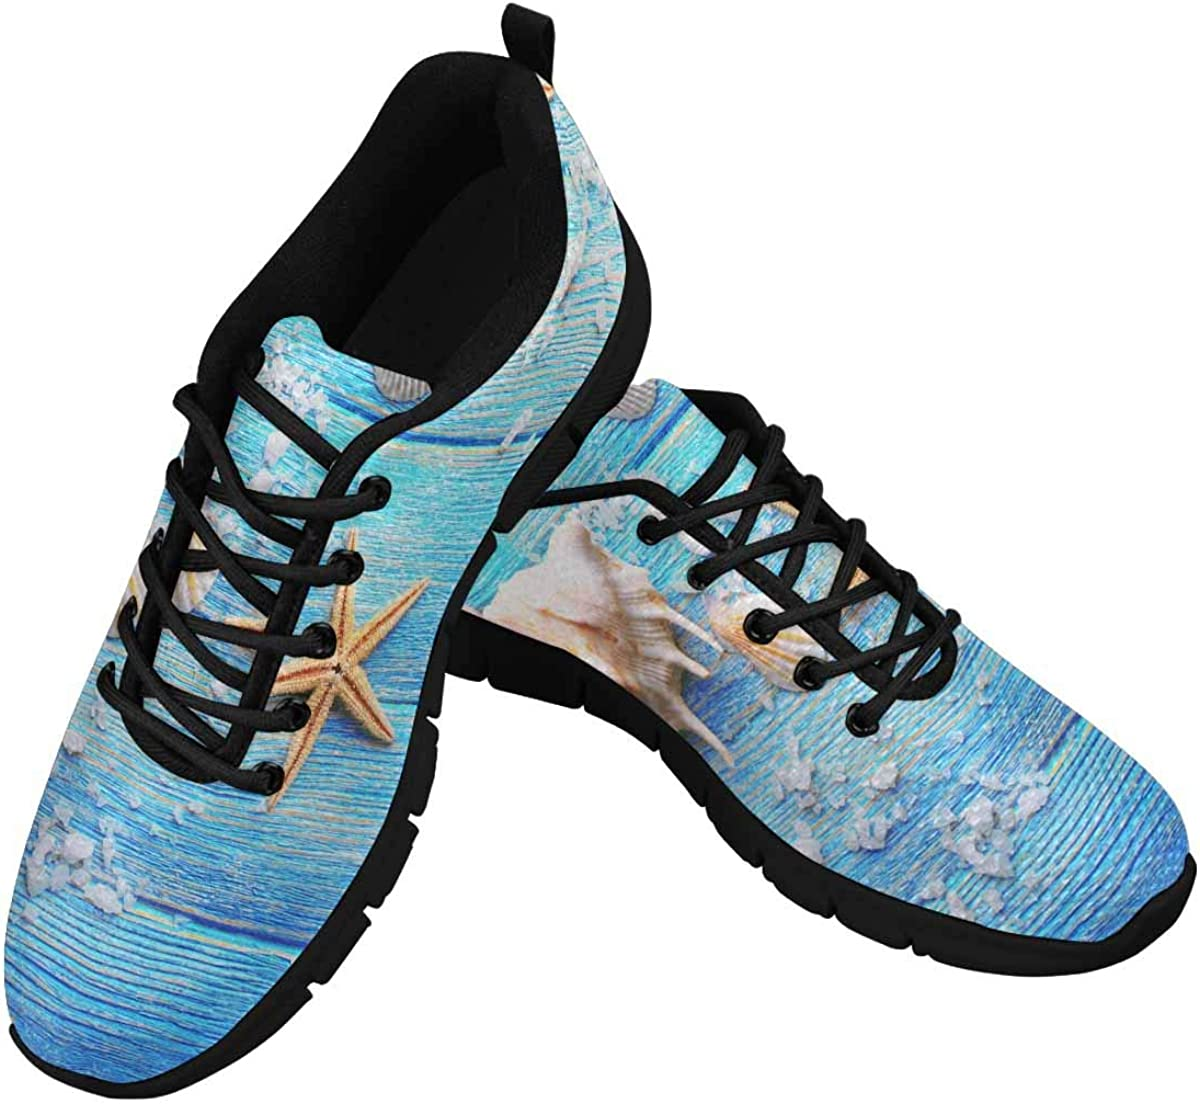 InterestPrint Starfish Seashell Wooden Women's Athletic Mesh Breathable Casual Sneaker